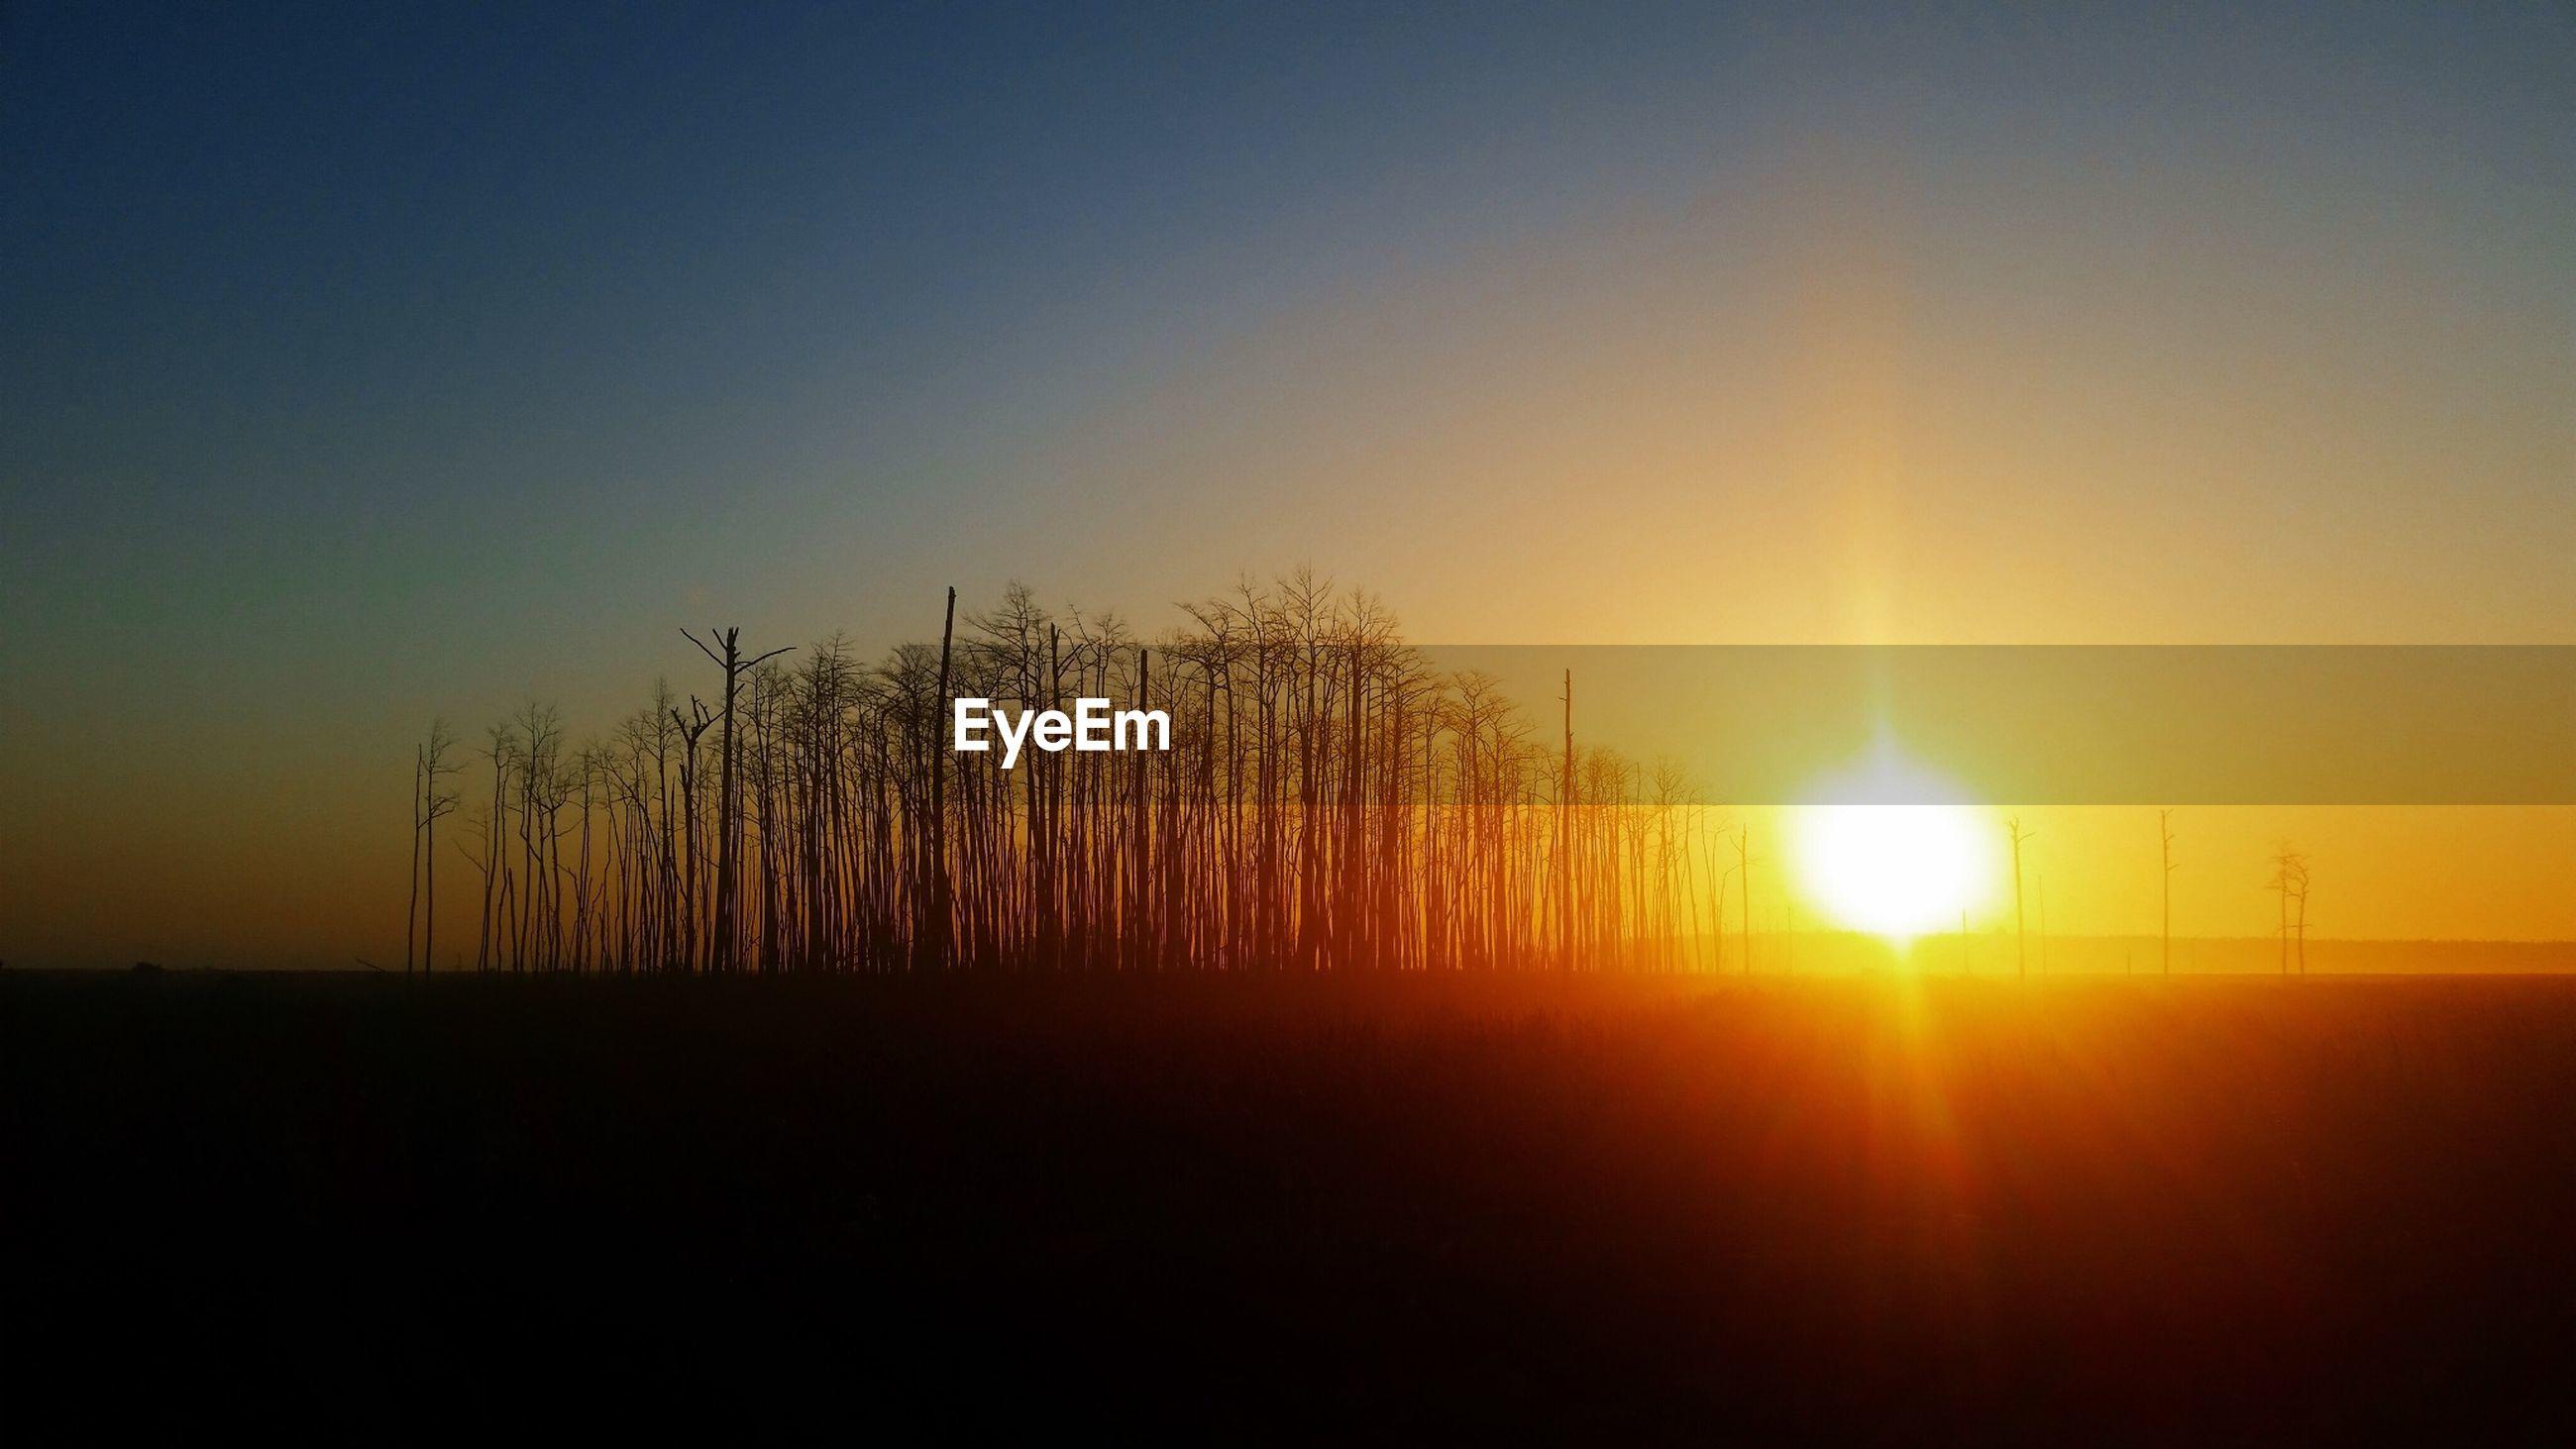 sunset, sun, silhouette, tranquil scene, tranquility, scenics, beauty in nature, orange color, clear sky, copy space, nature, idyllic, sunlight, landscape, tree, field, back lit, sky, dark, sunbeam